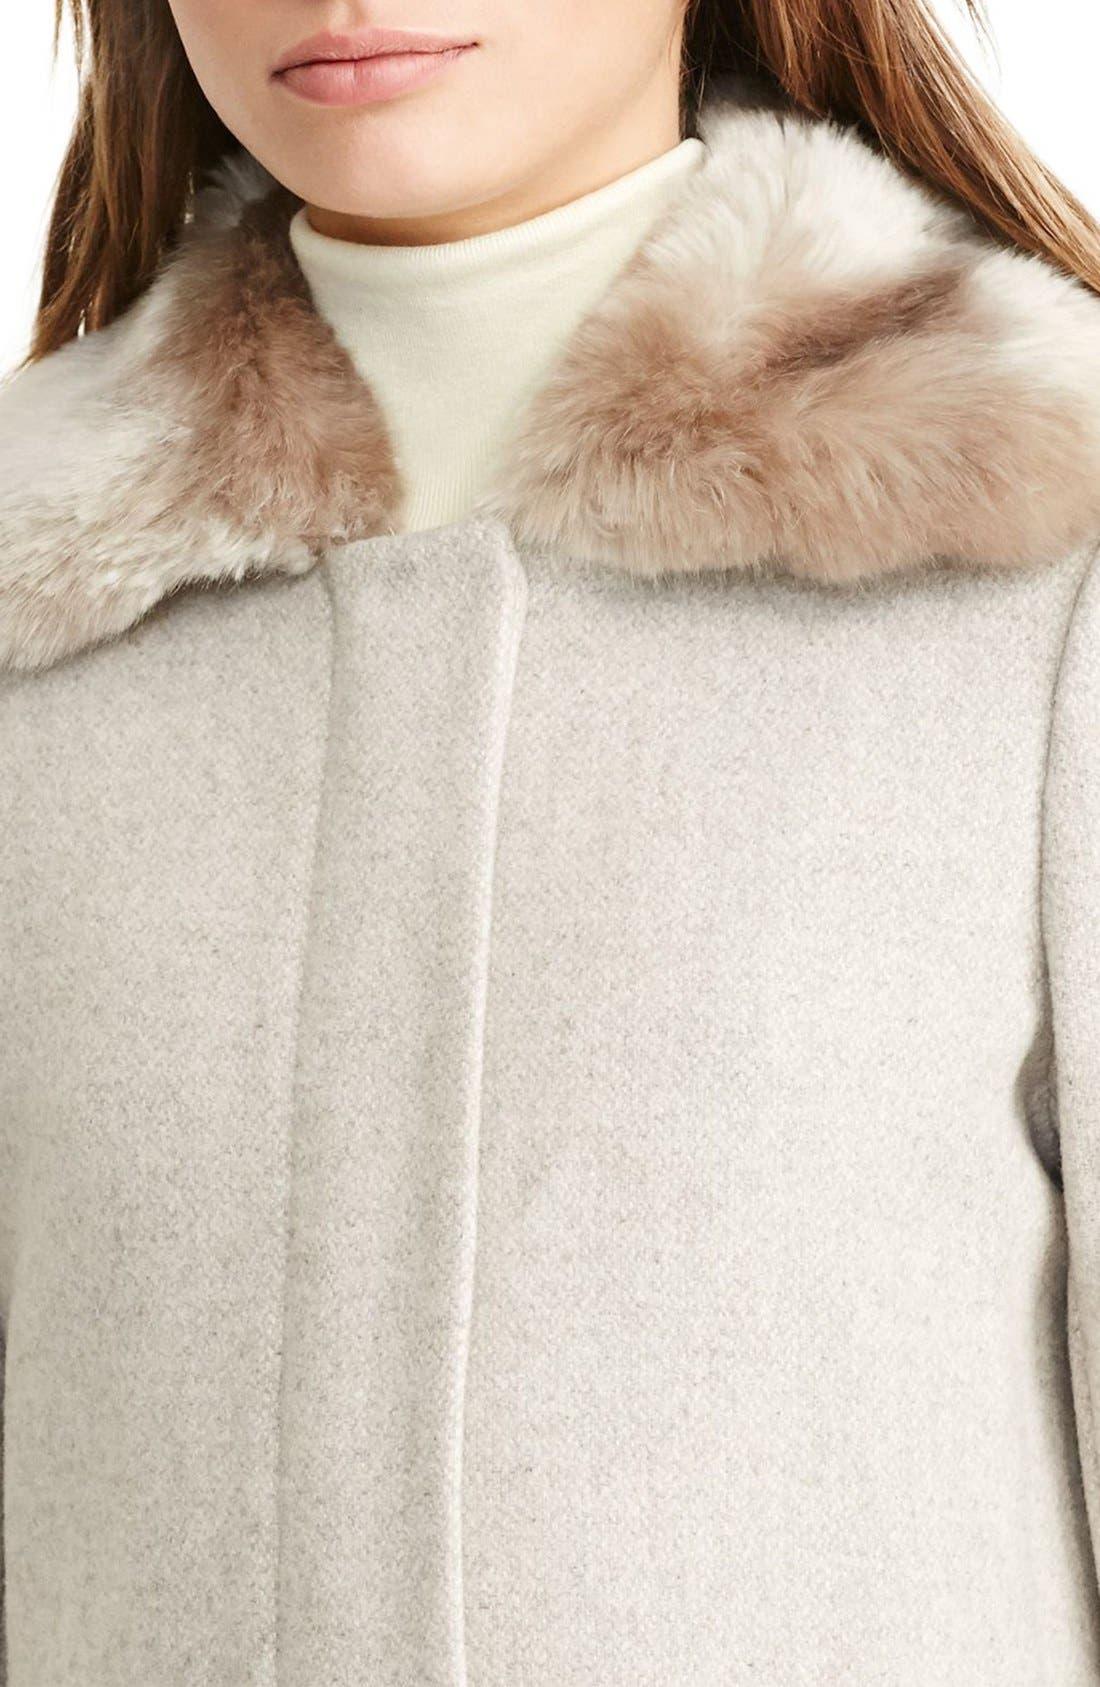 LAUREN RALPH LAUREN,                             Wool Blend Coat with Faux Fur Collar,                             Alternate thumbnail 4, color,                             068